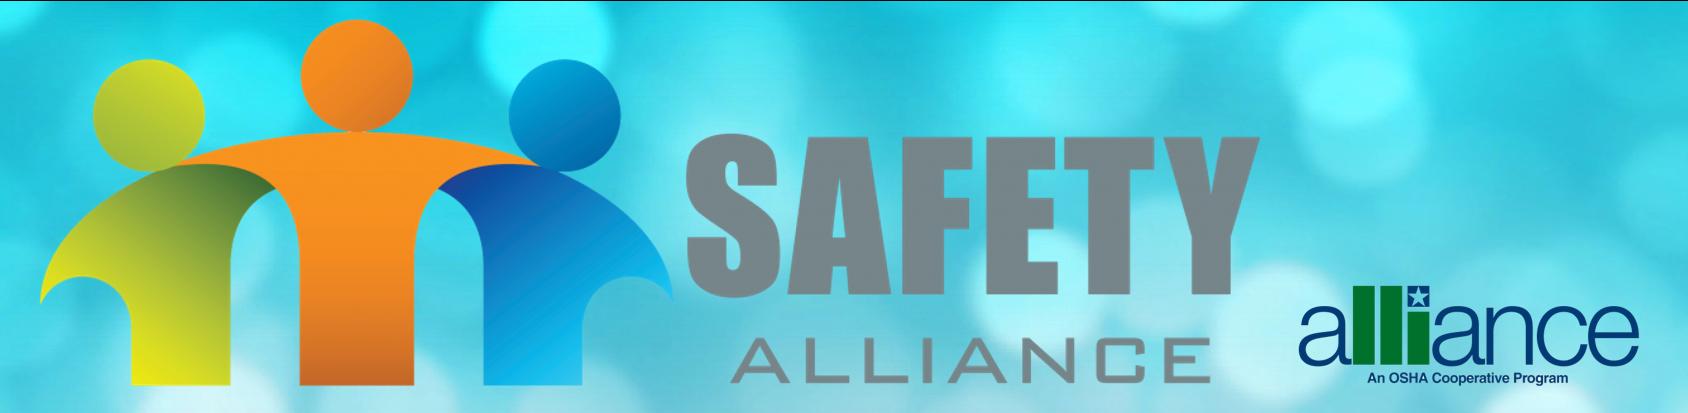 safety-alliance-osha-alliance-header-2020